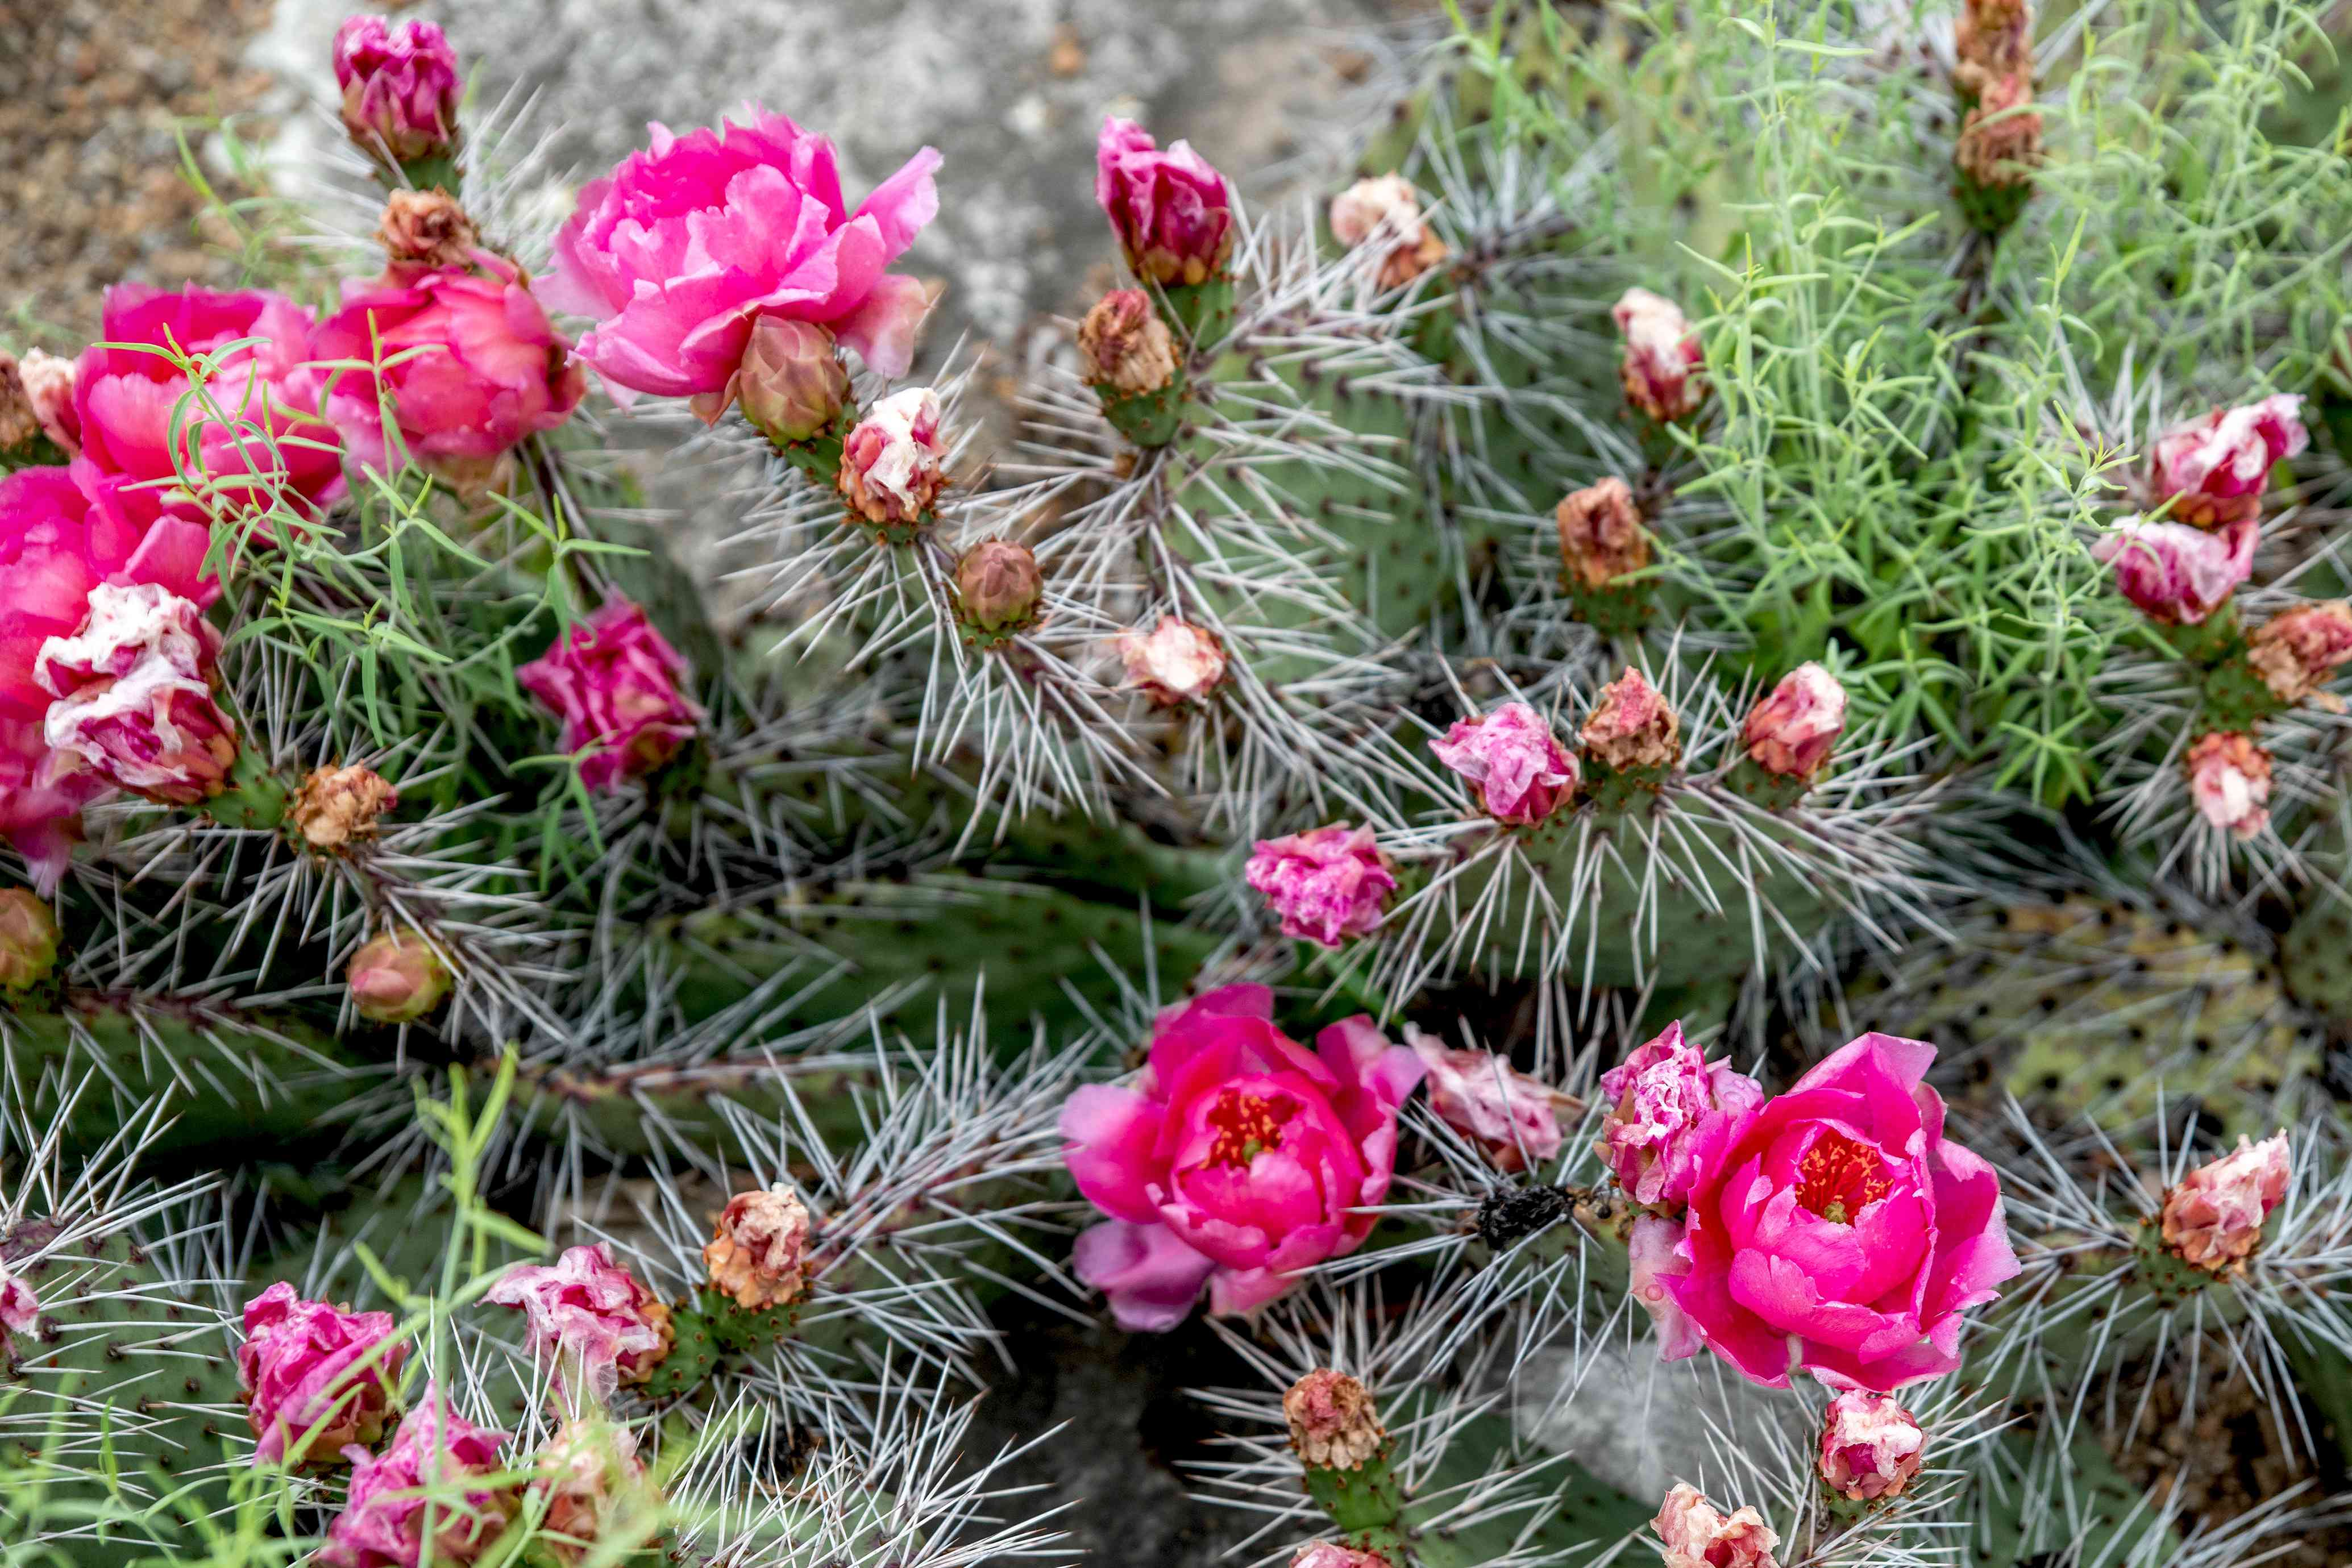 flowering prickly pear cacti